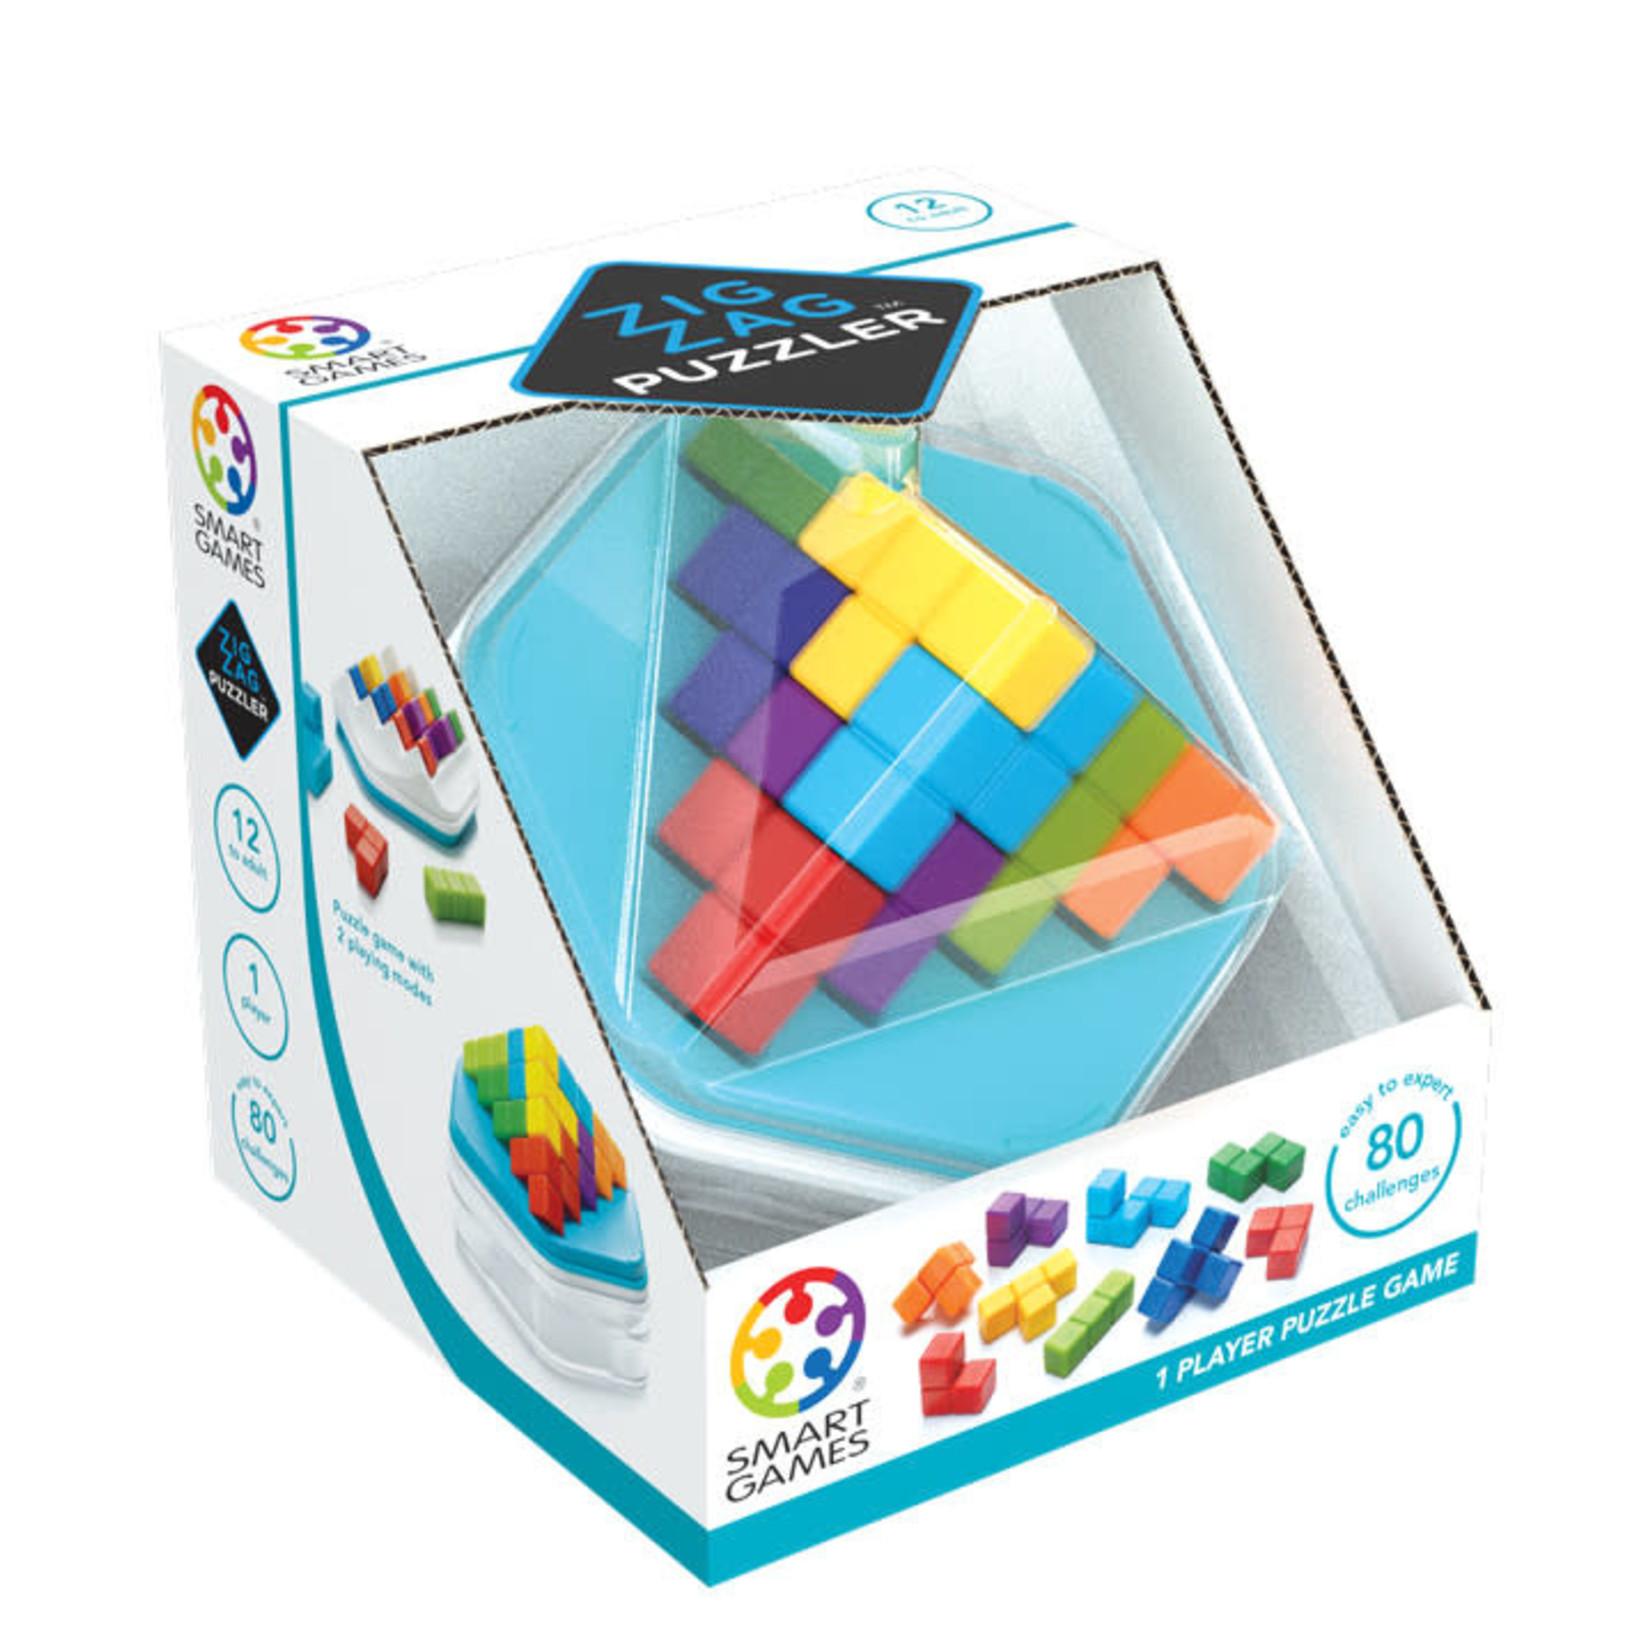 Smart Toys Zig Zag Puzzler